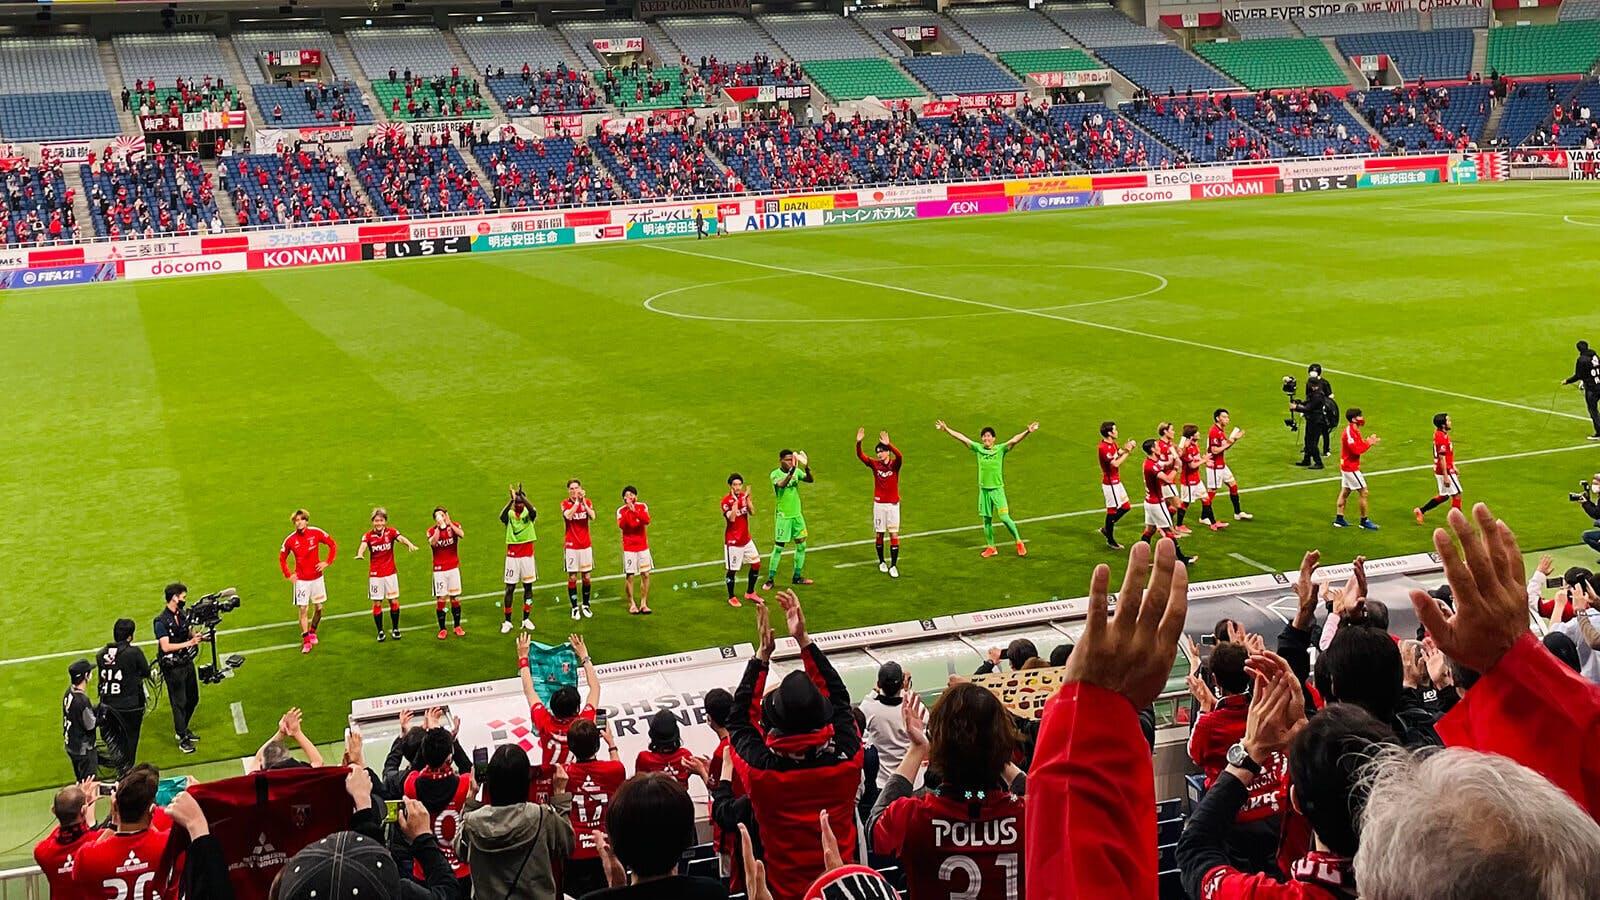 2021 Jリーグ 第15節 埼玉スタジアム2002 ヴィッセル神戸戦 試合終了後の様子